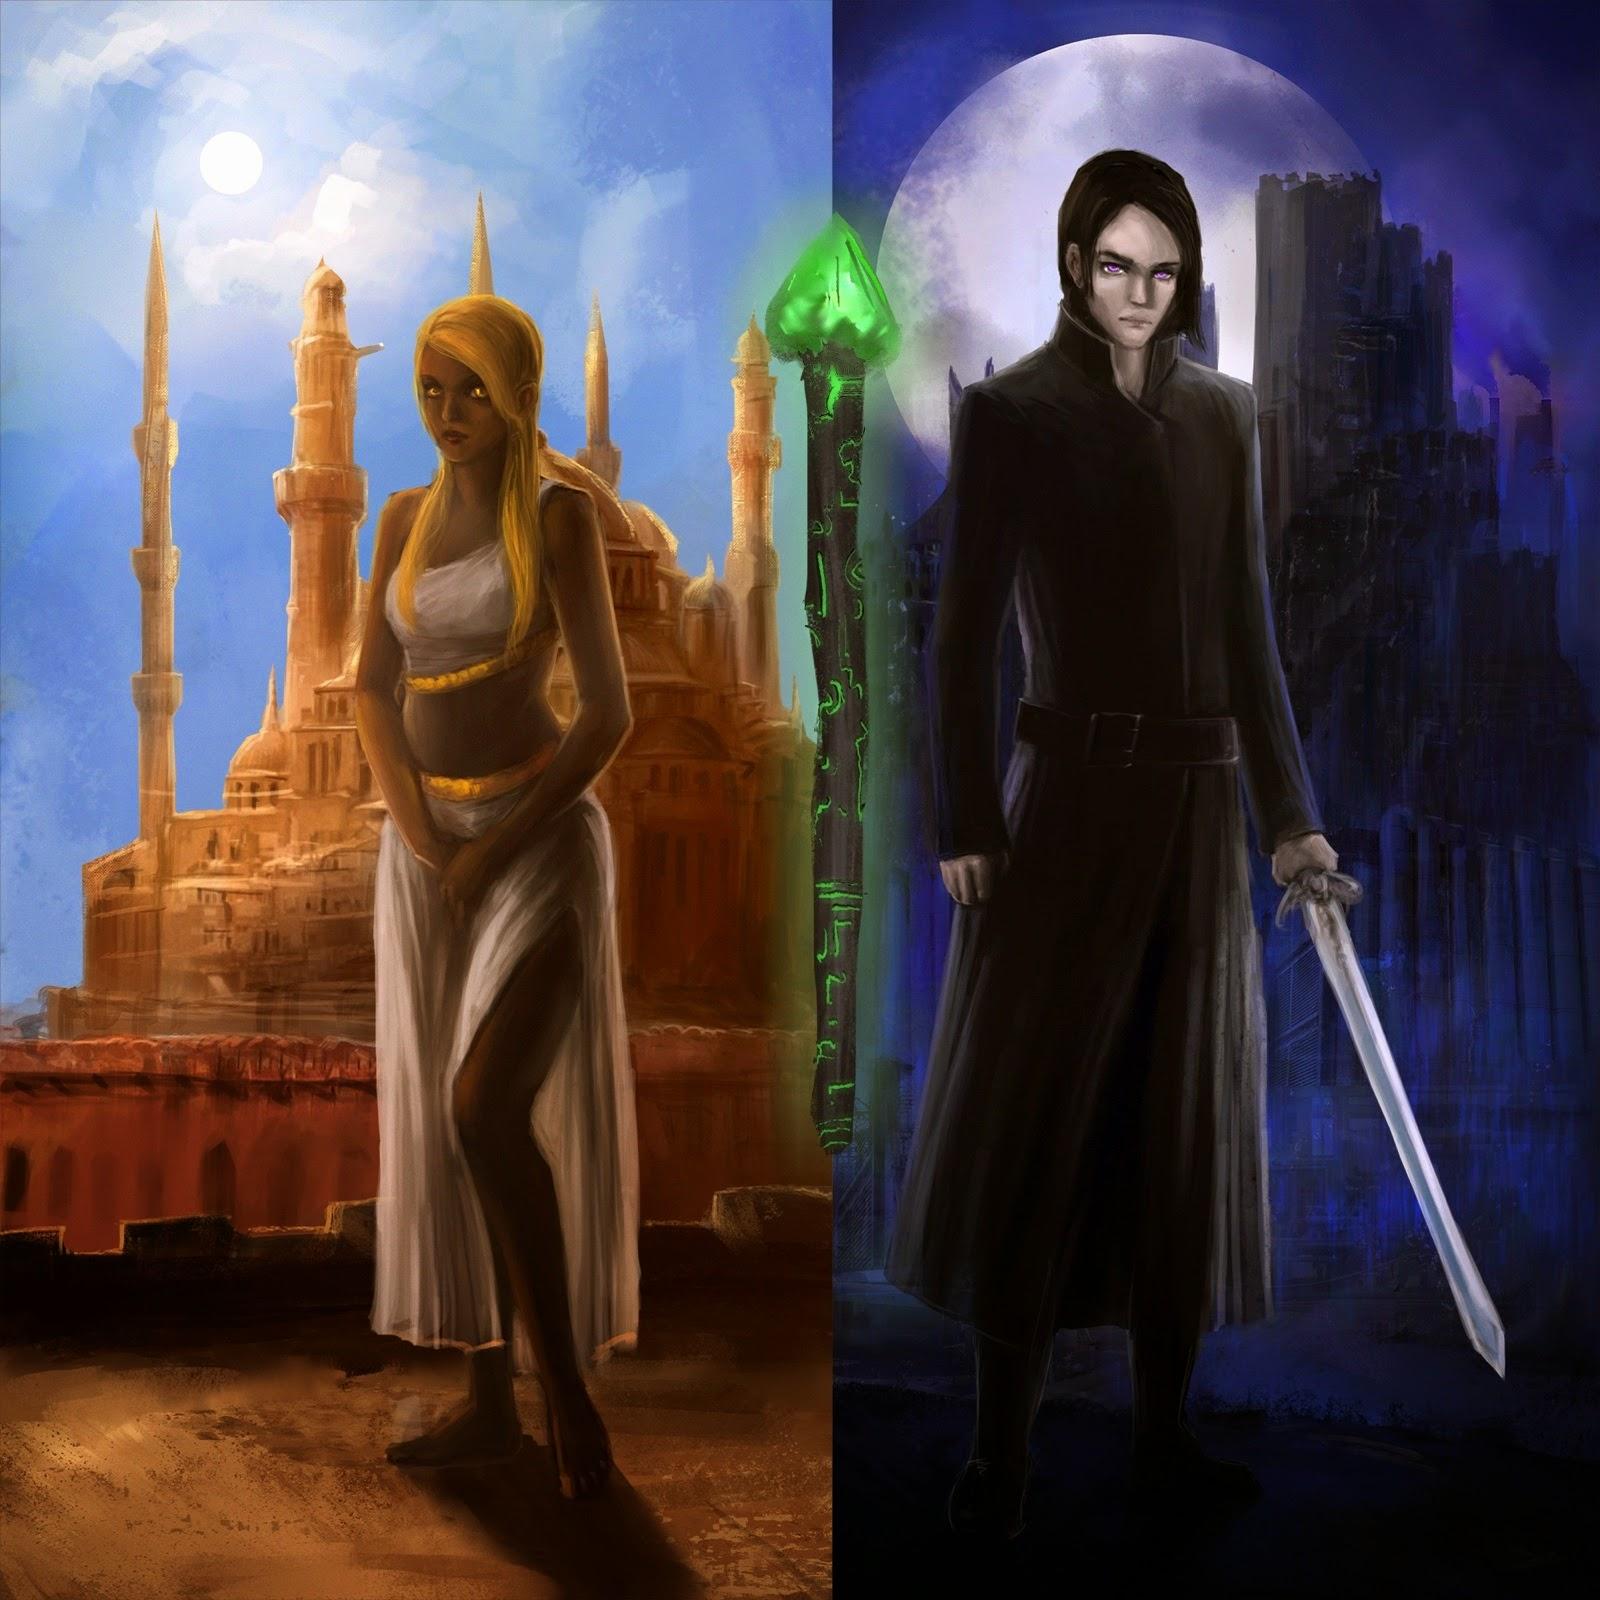 the staff of tzaddi, t.n. newborn, epic fantasy, fantasy novel